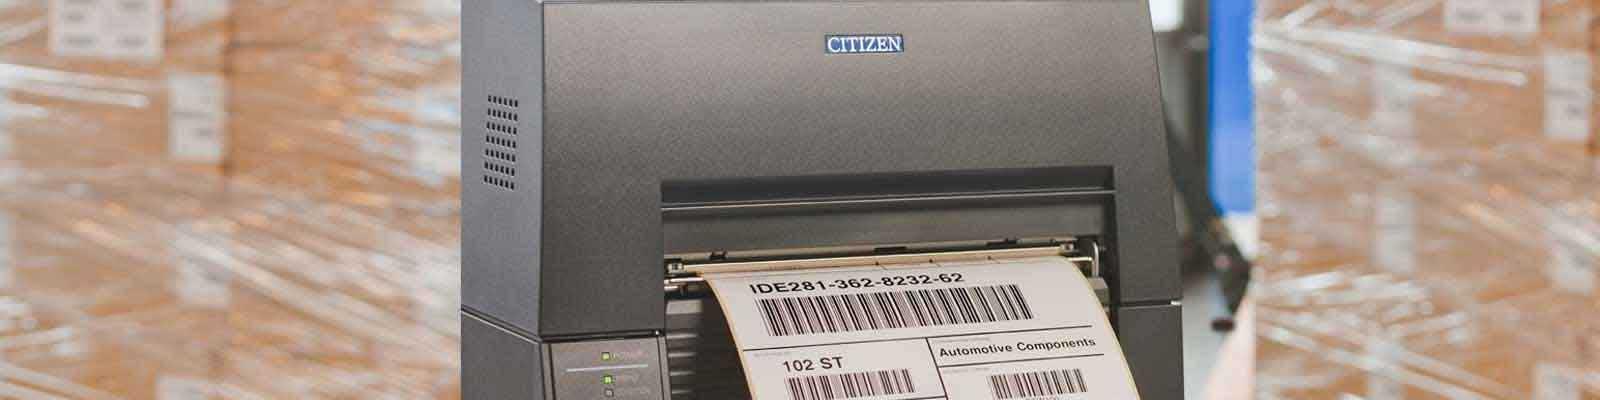 Impresoras Industriales Citizen